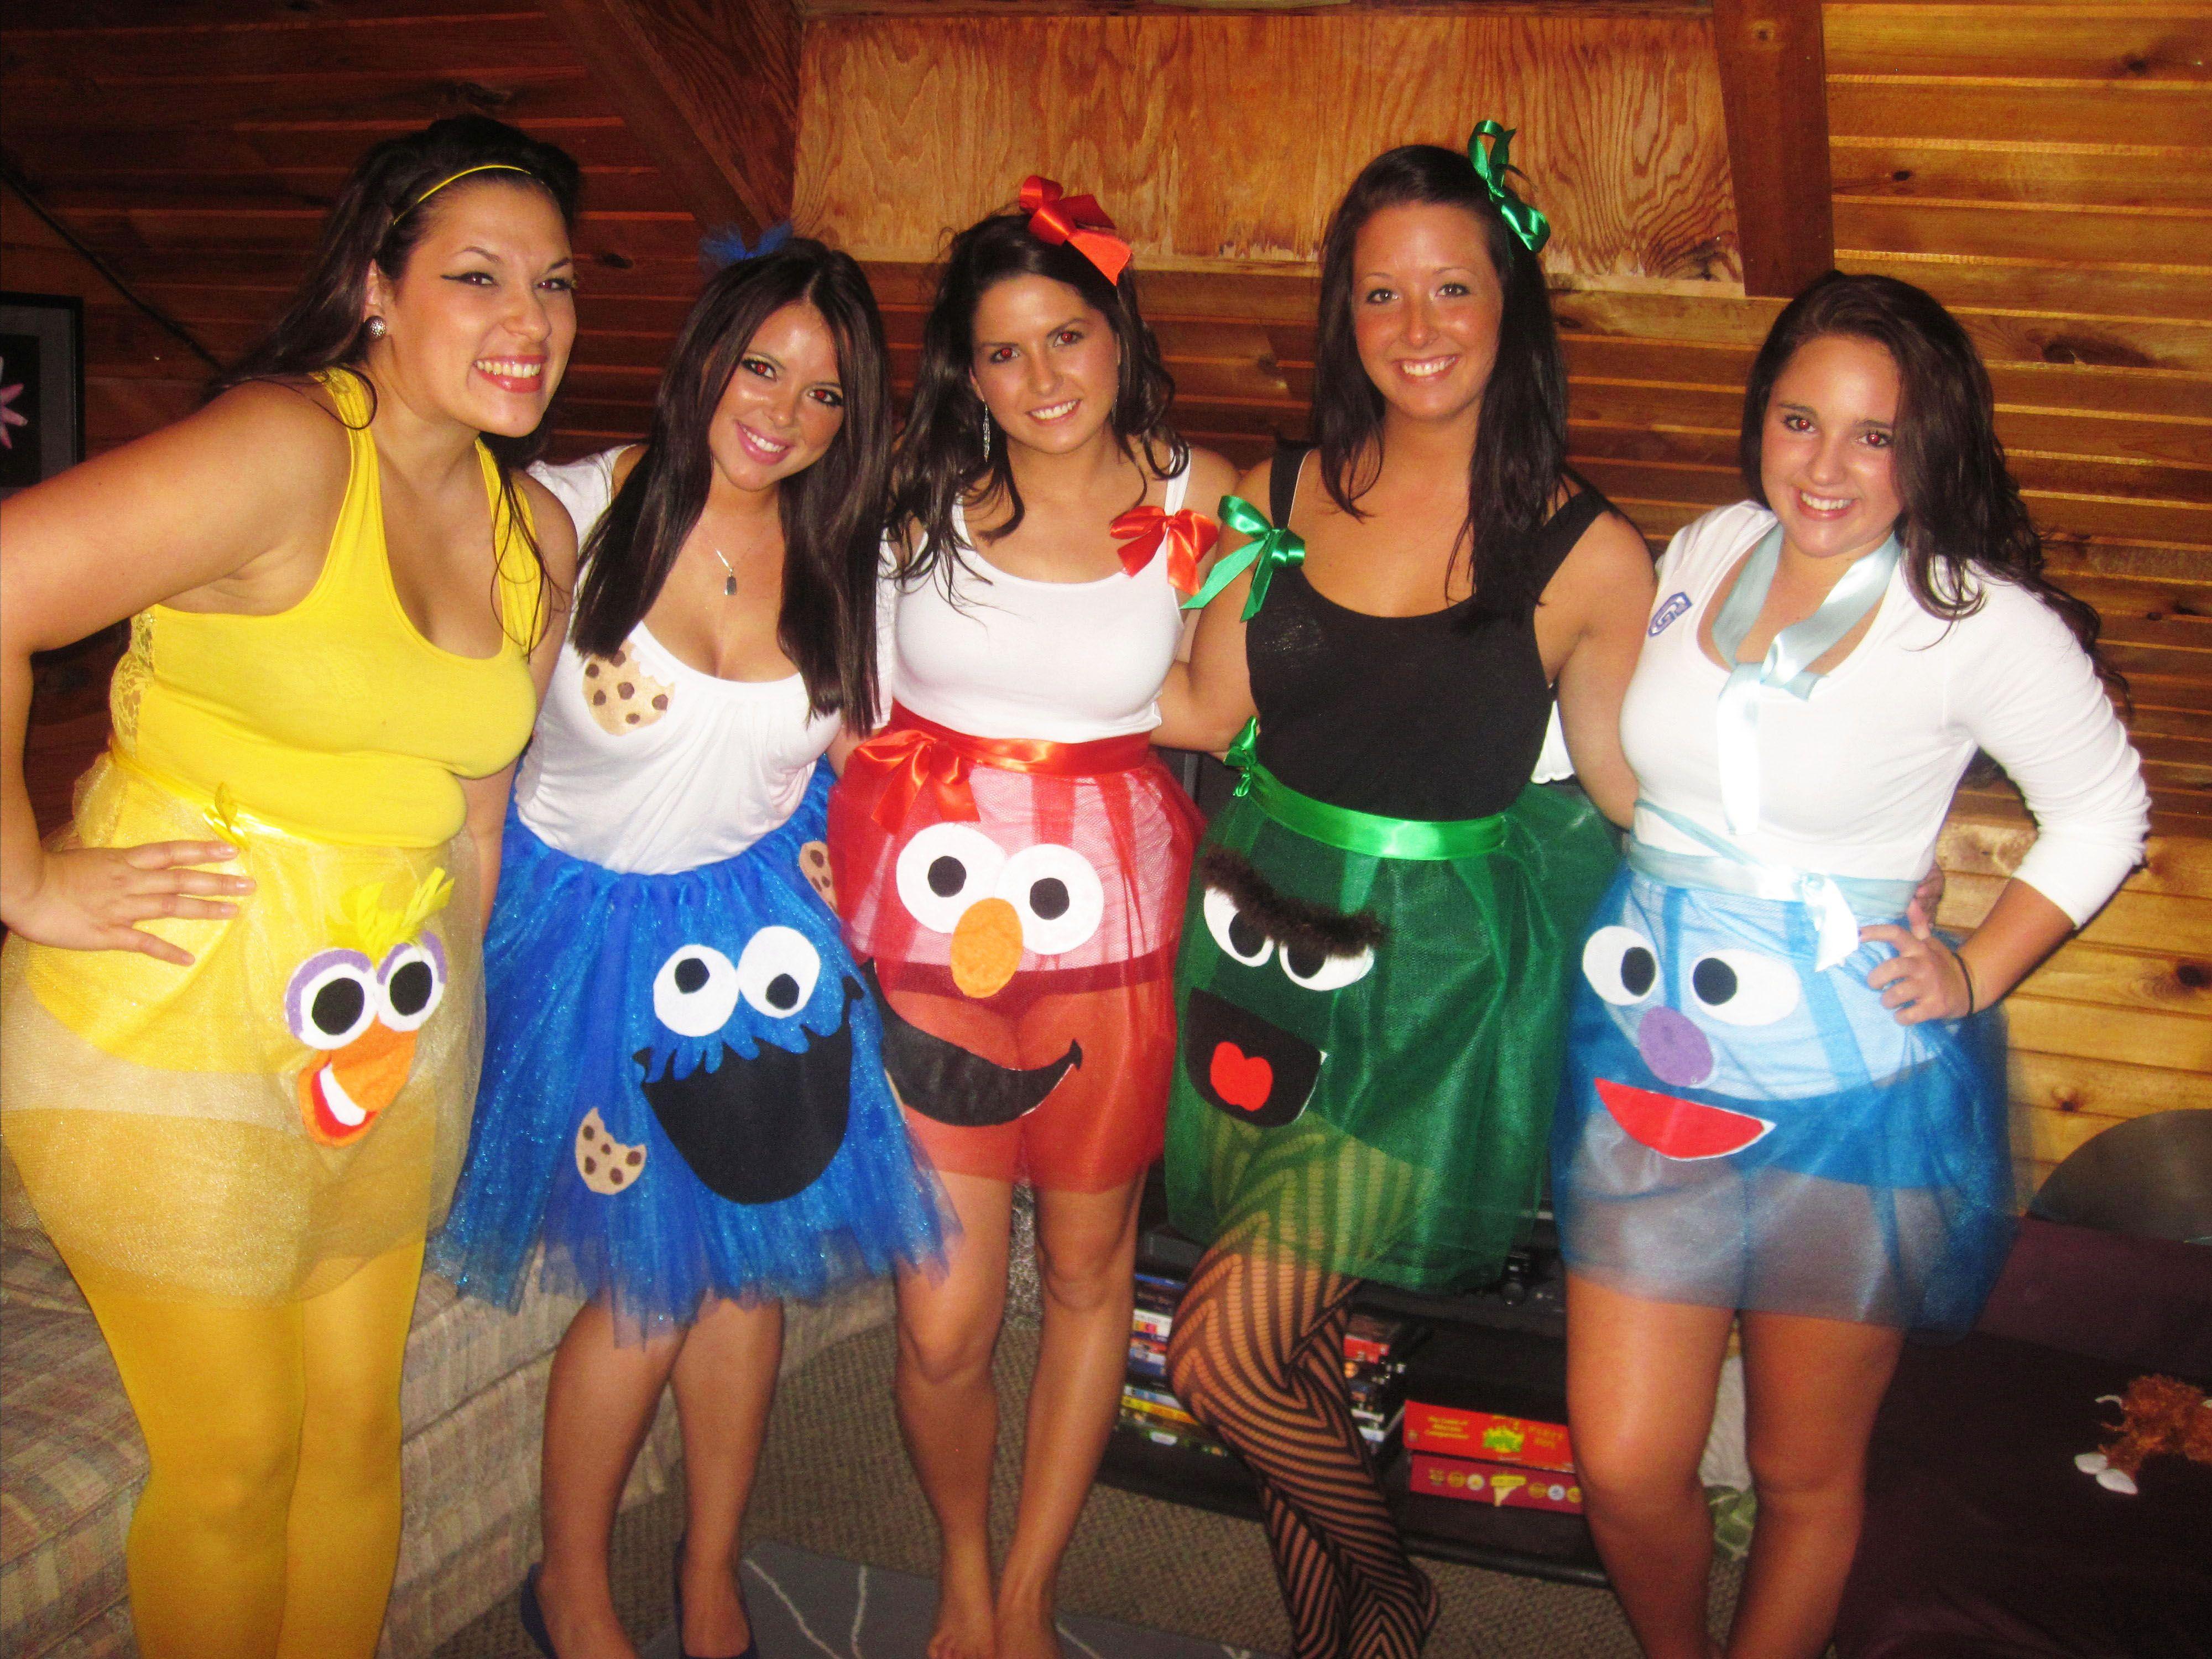 Sesame Street Diy Group Halloween Costumes Cookie Monster Costume Running Costumes Halloween Costumes